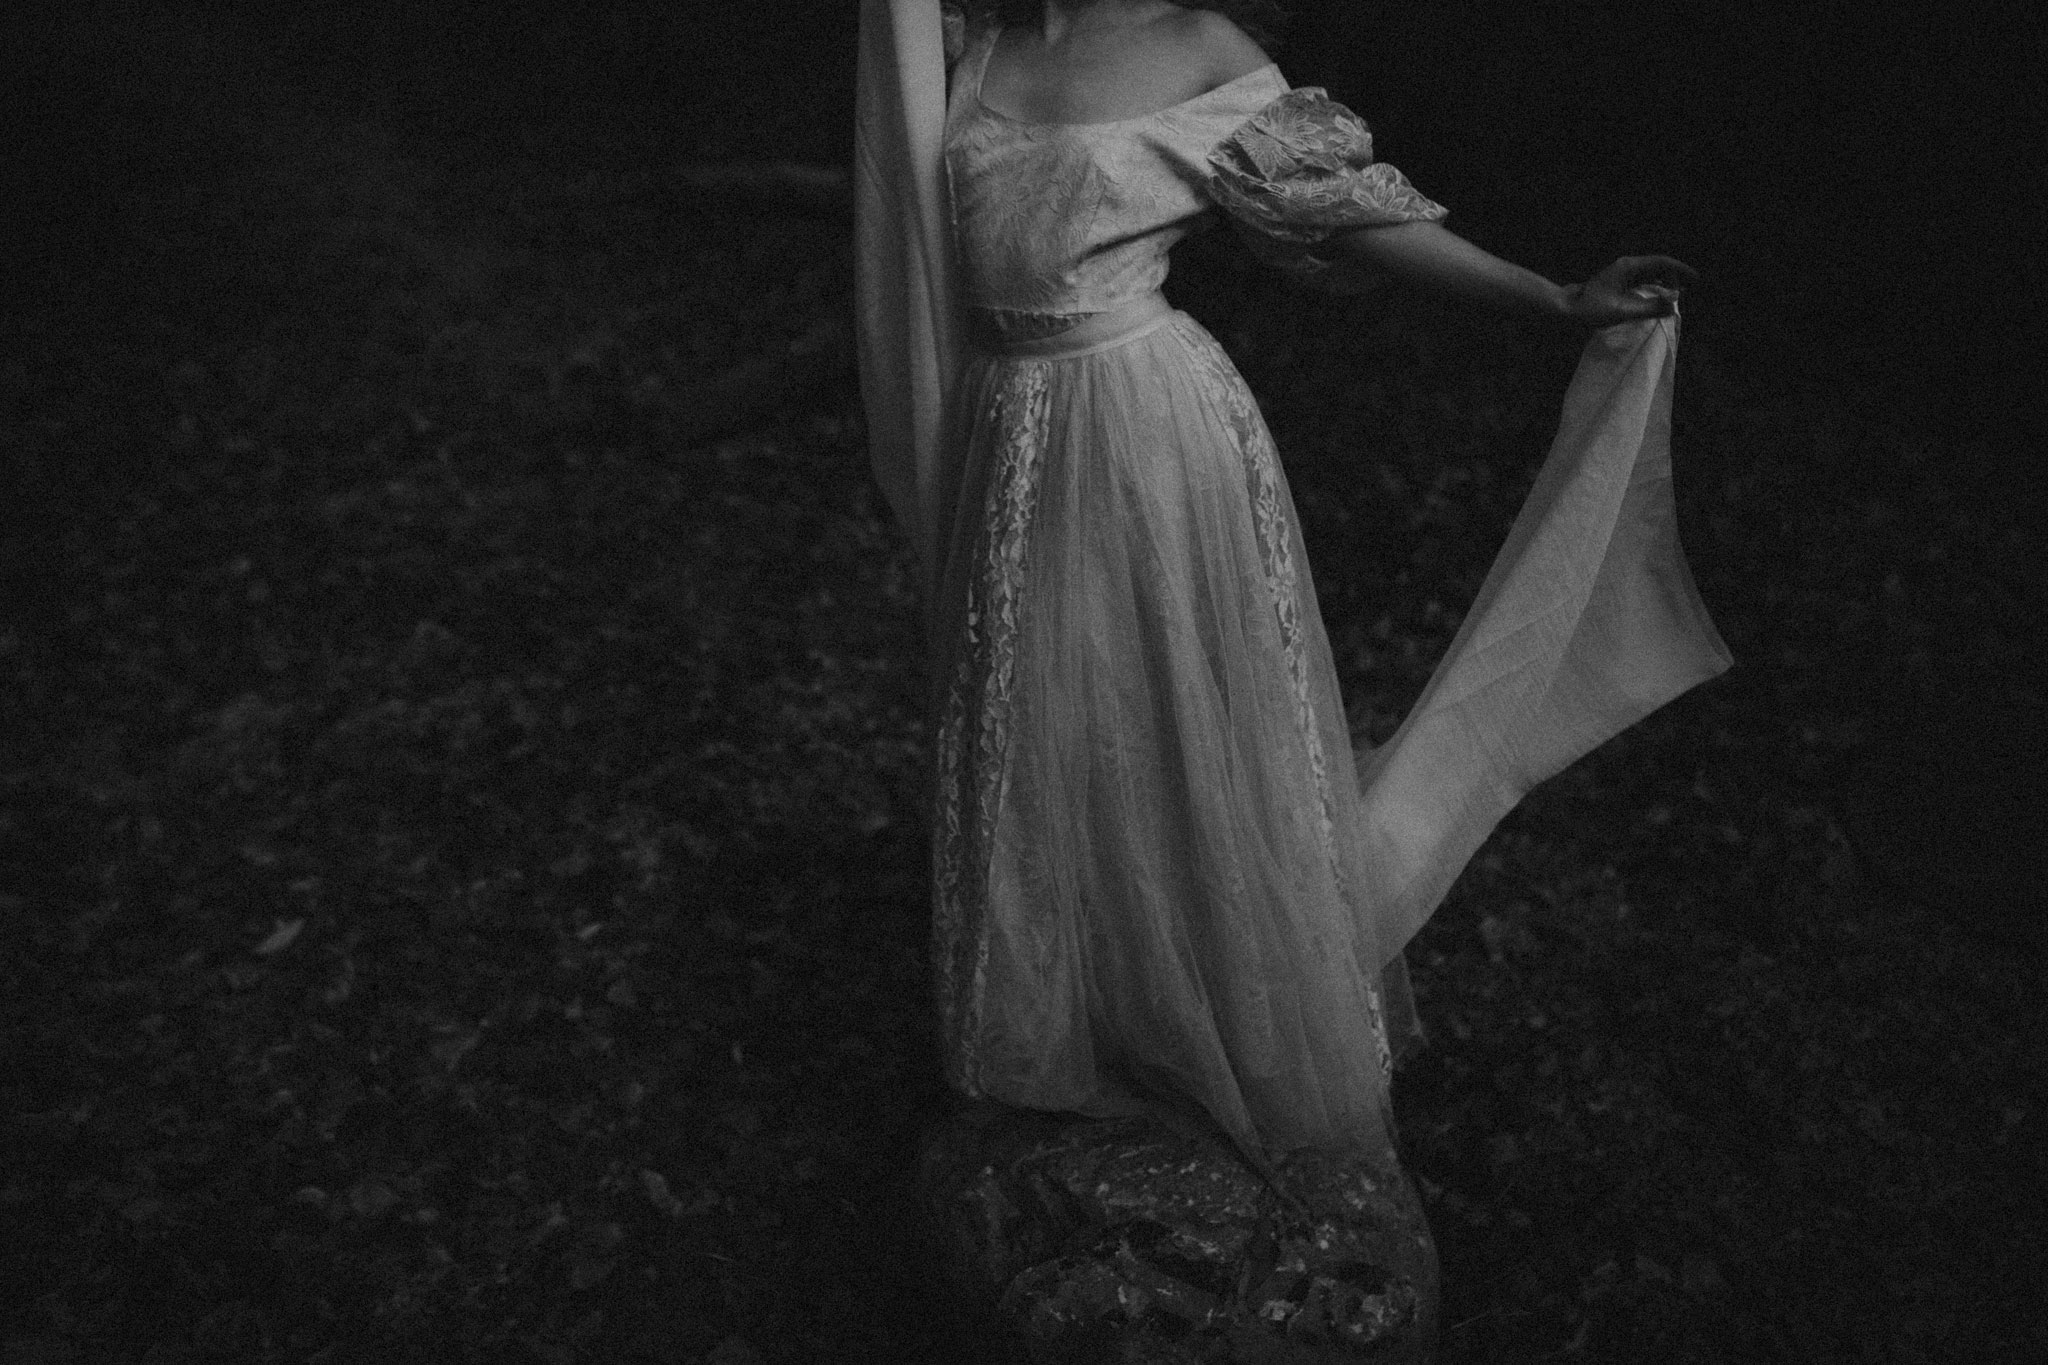 pale-witch-222fb.jpg